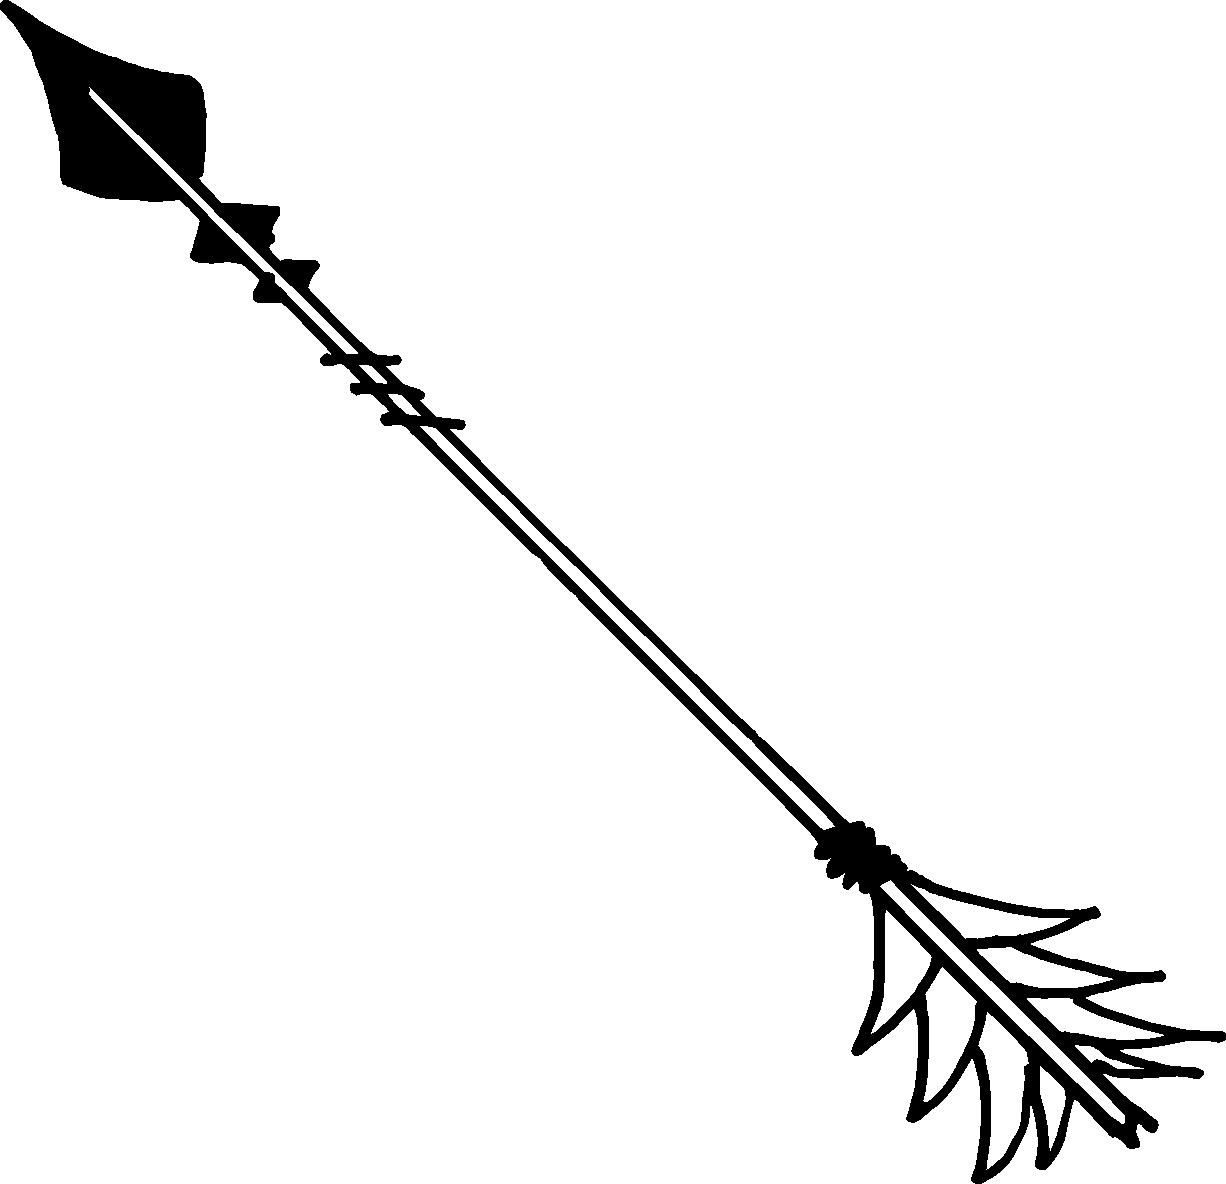 1226x1184 Hd Arrow Drawing